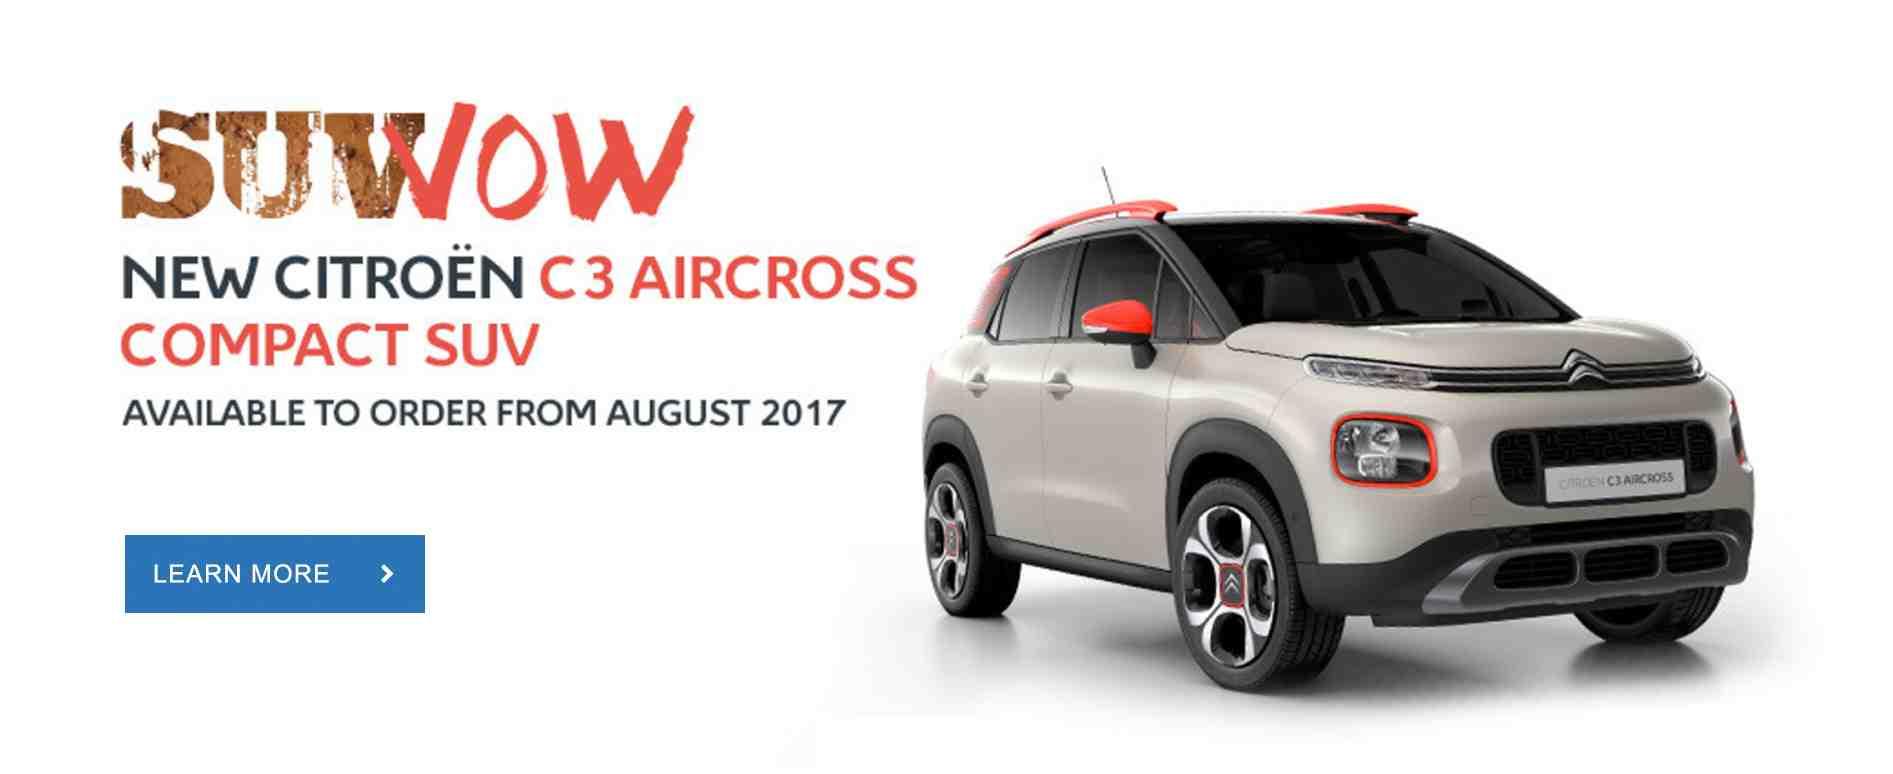 New C3 Aircross